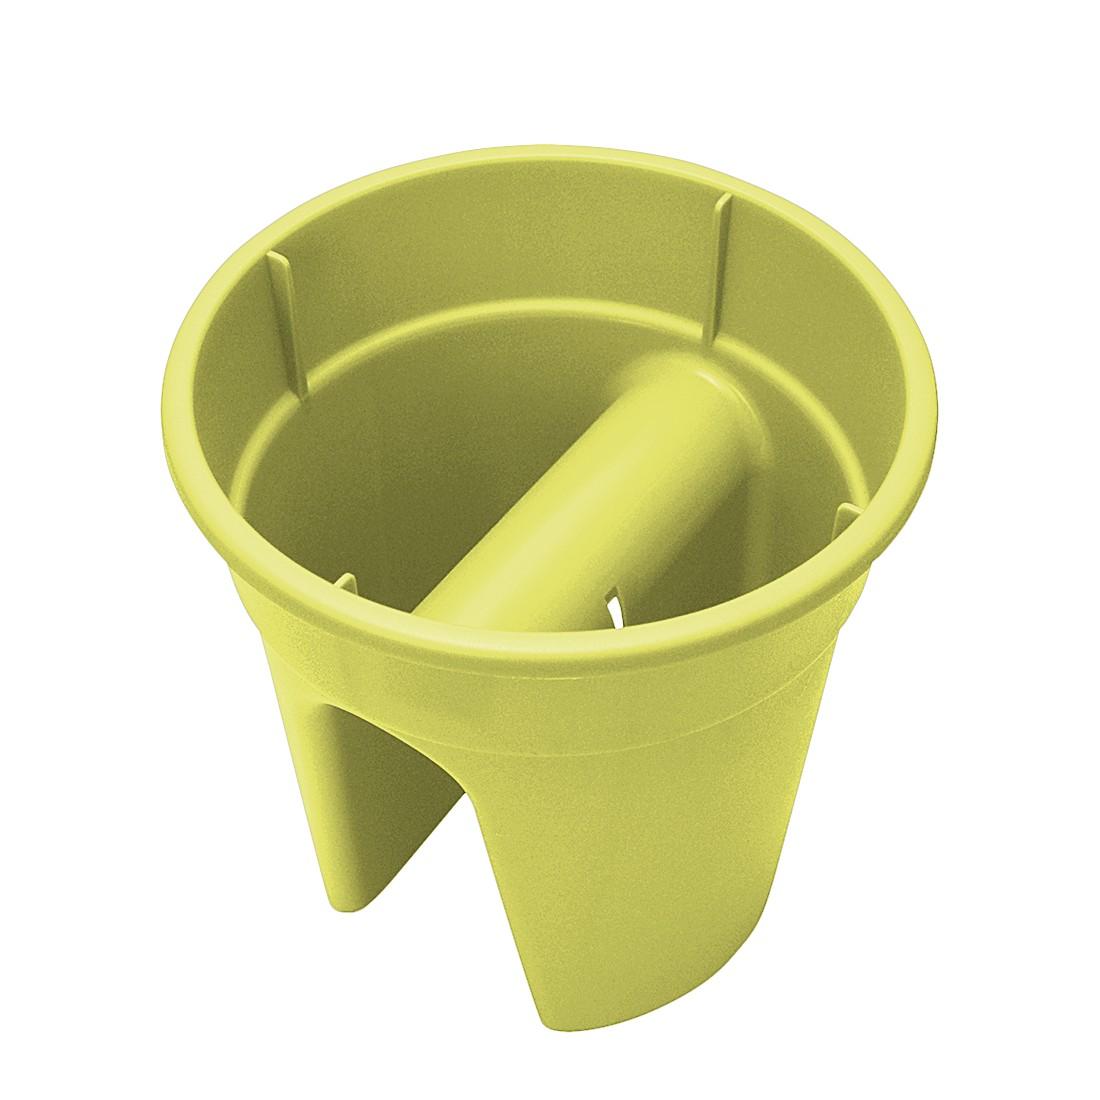 Blumentopf Flowerclip (3er-Set) – Kunststoff Hellgrün, Khw kaufen